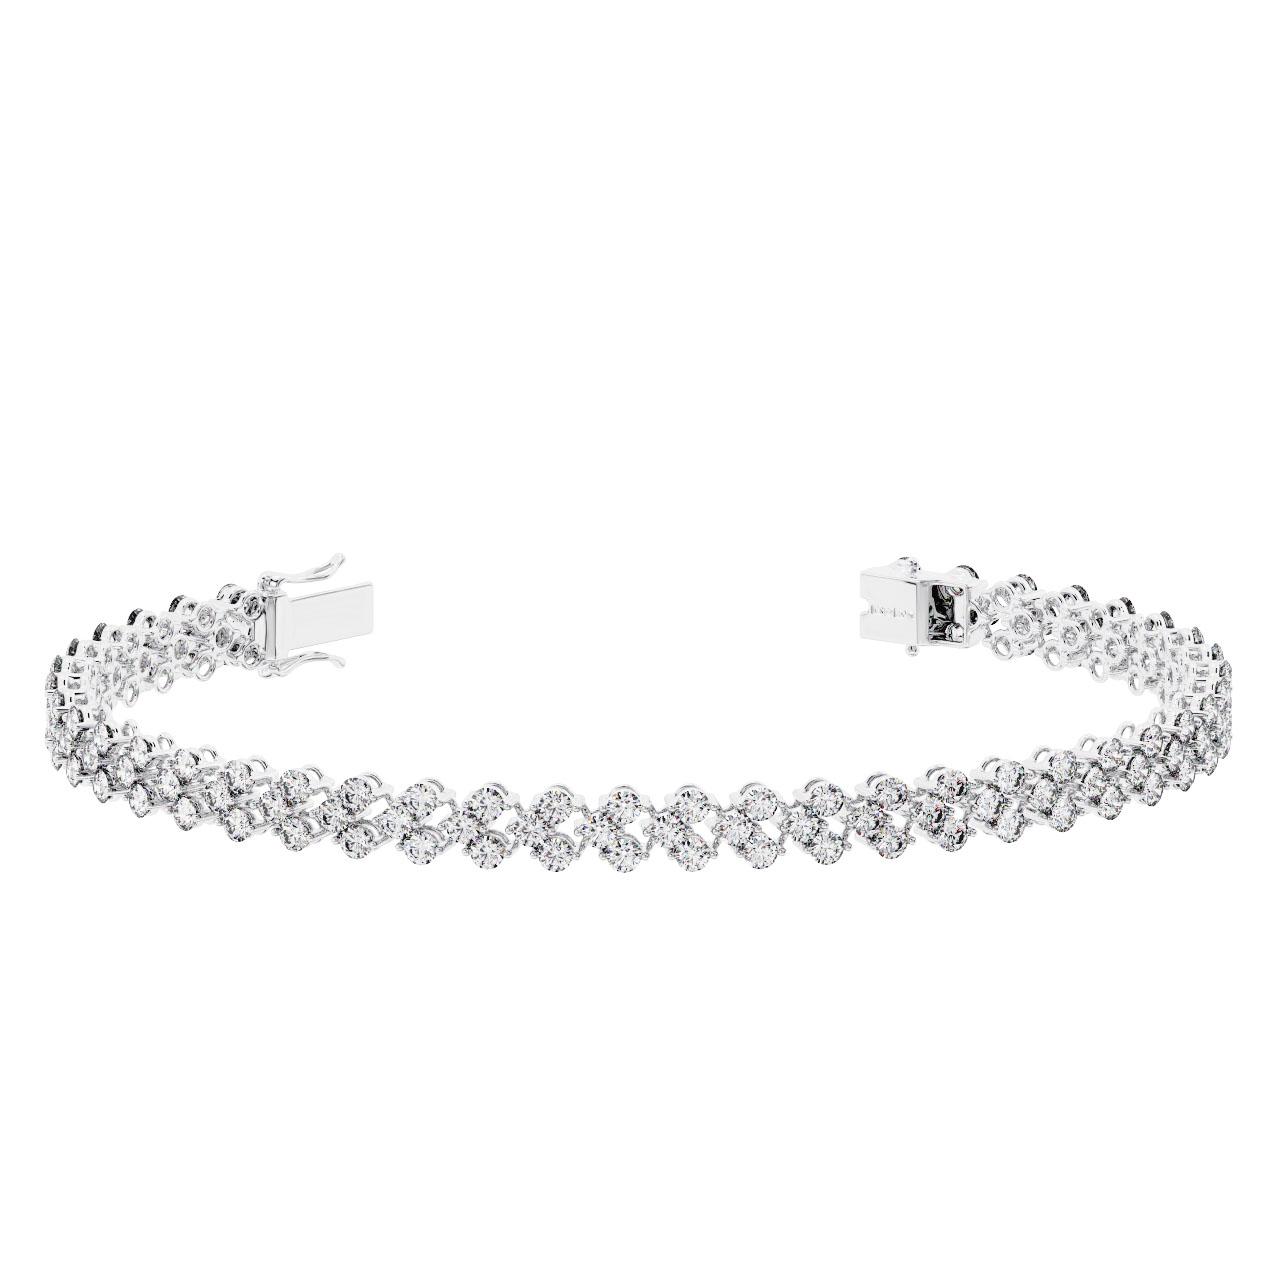 94b936d78e5e Brand New 6.00 carat Round Brilliant Cut Diamonds Double Row Tennis Bracelet  9K Gold Hallmarked By Assay Office London